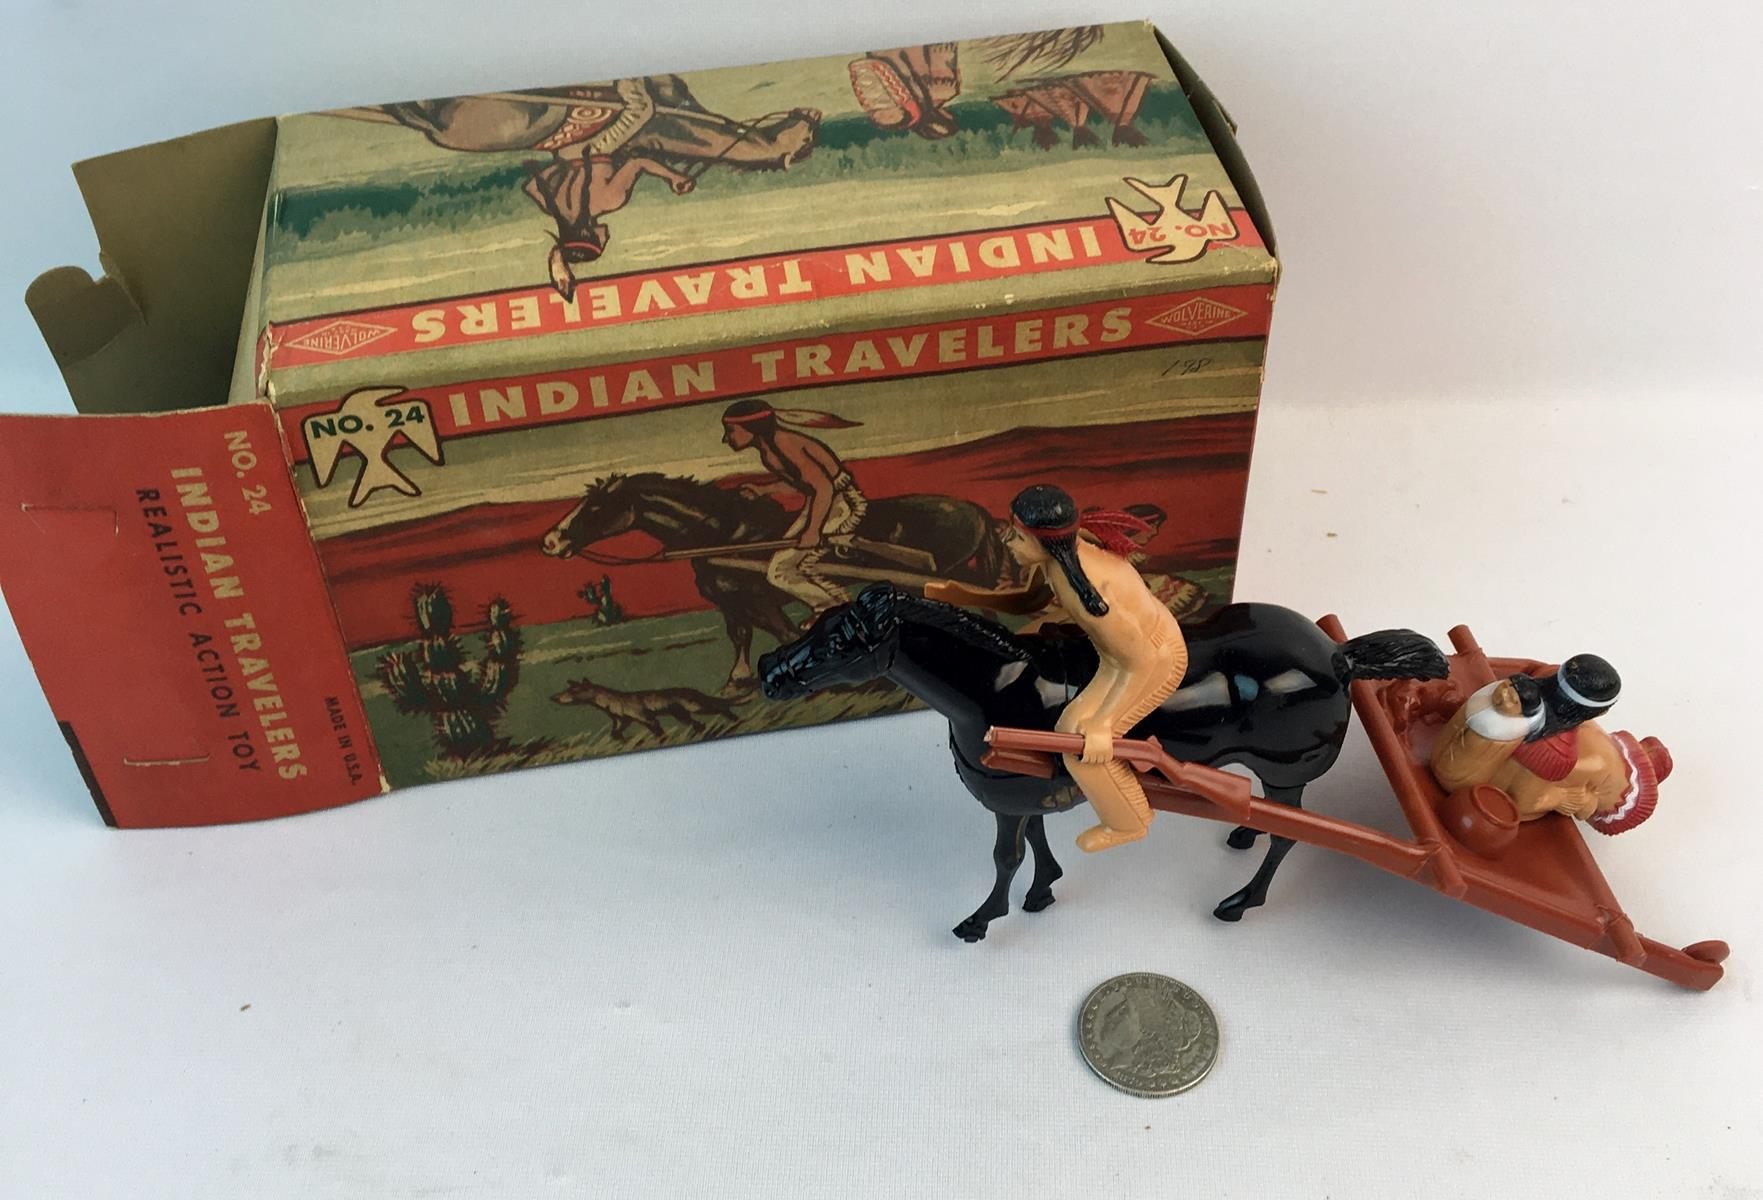 Vintage 1950's Wolverine Brand Wind-Up Indian Travelers Figure w/ Original Box WORKS